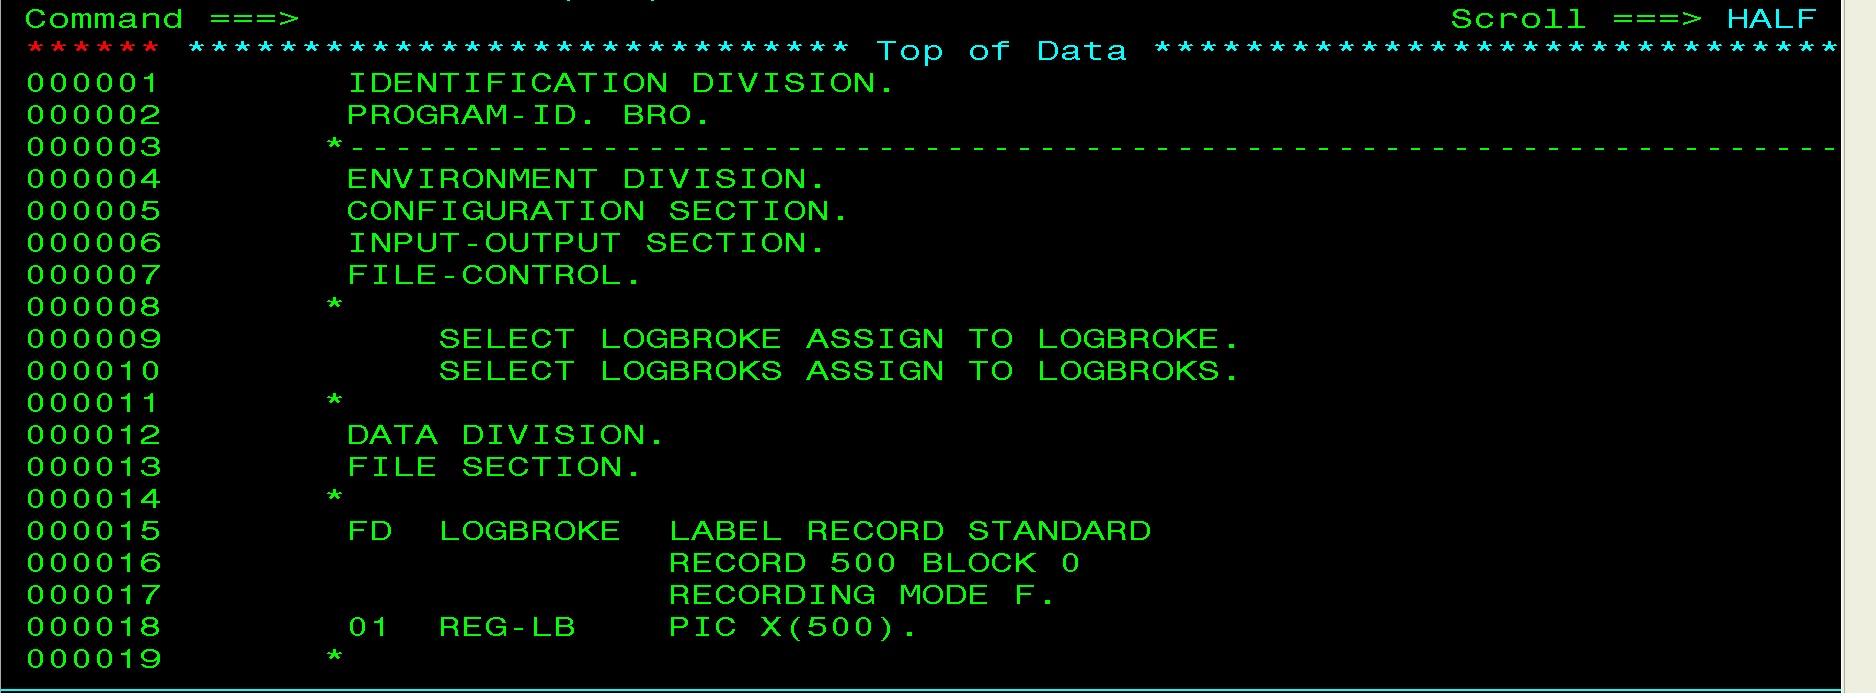 Viejos programadores COBOL al rescate